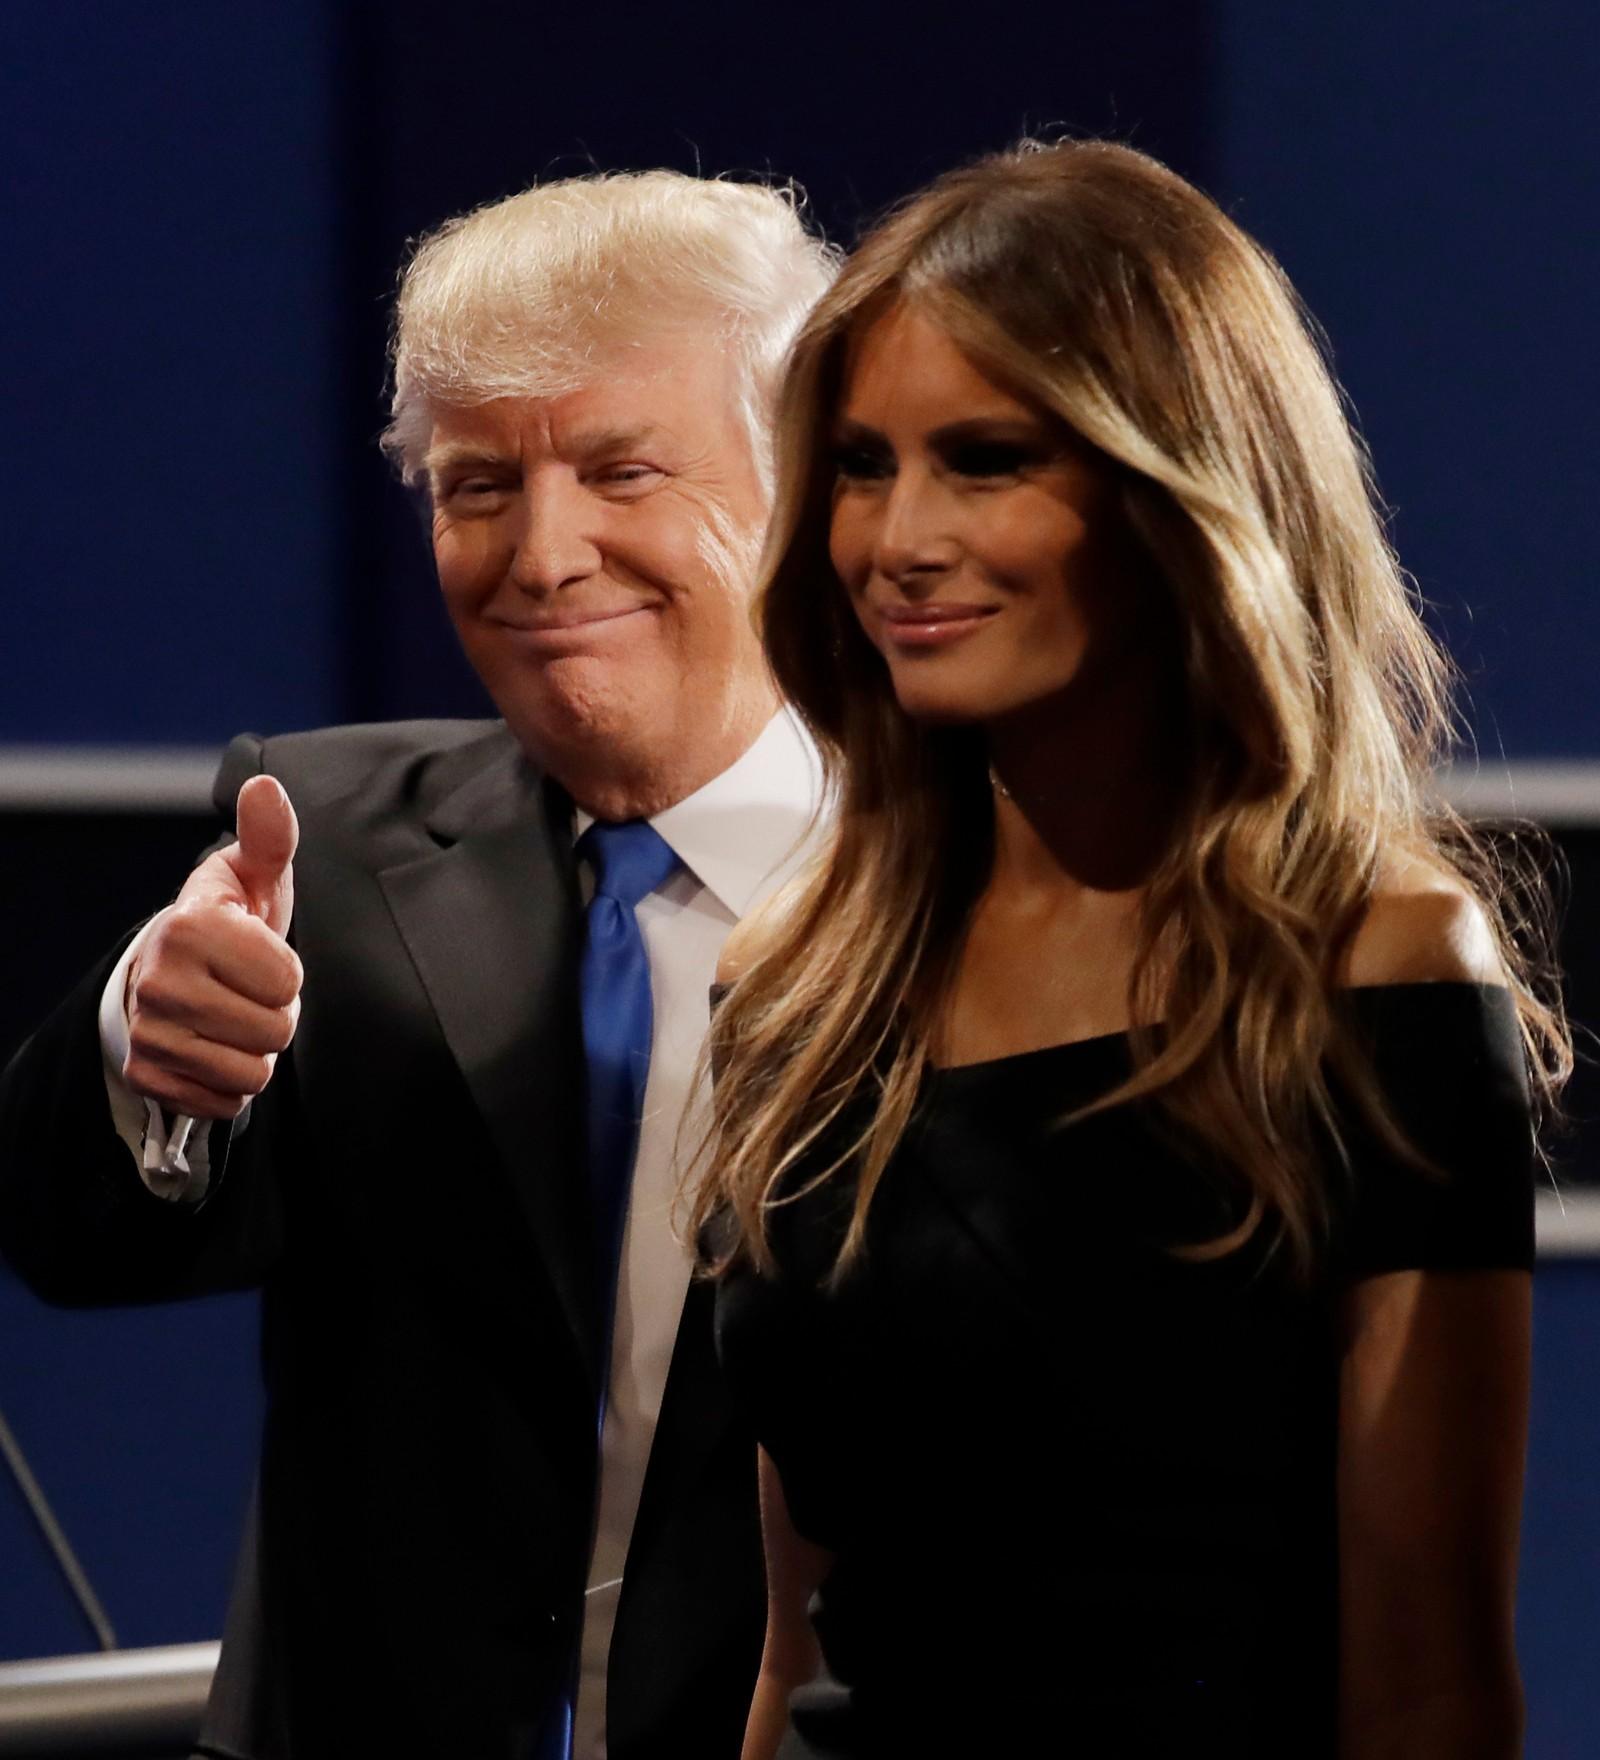 Donald Trump gir sin karakteristiske tommel sammen med kona Melania, straks etter at debatten var ferdig.